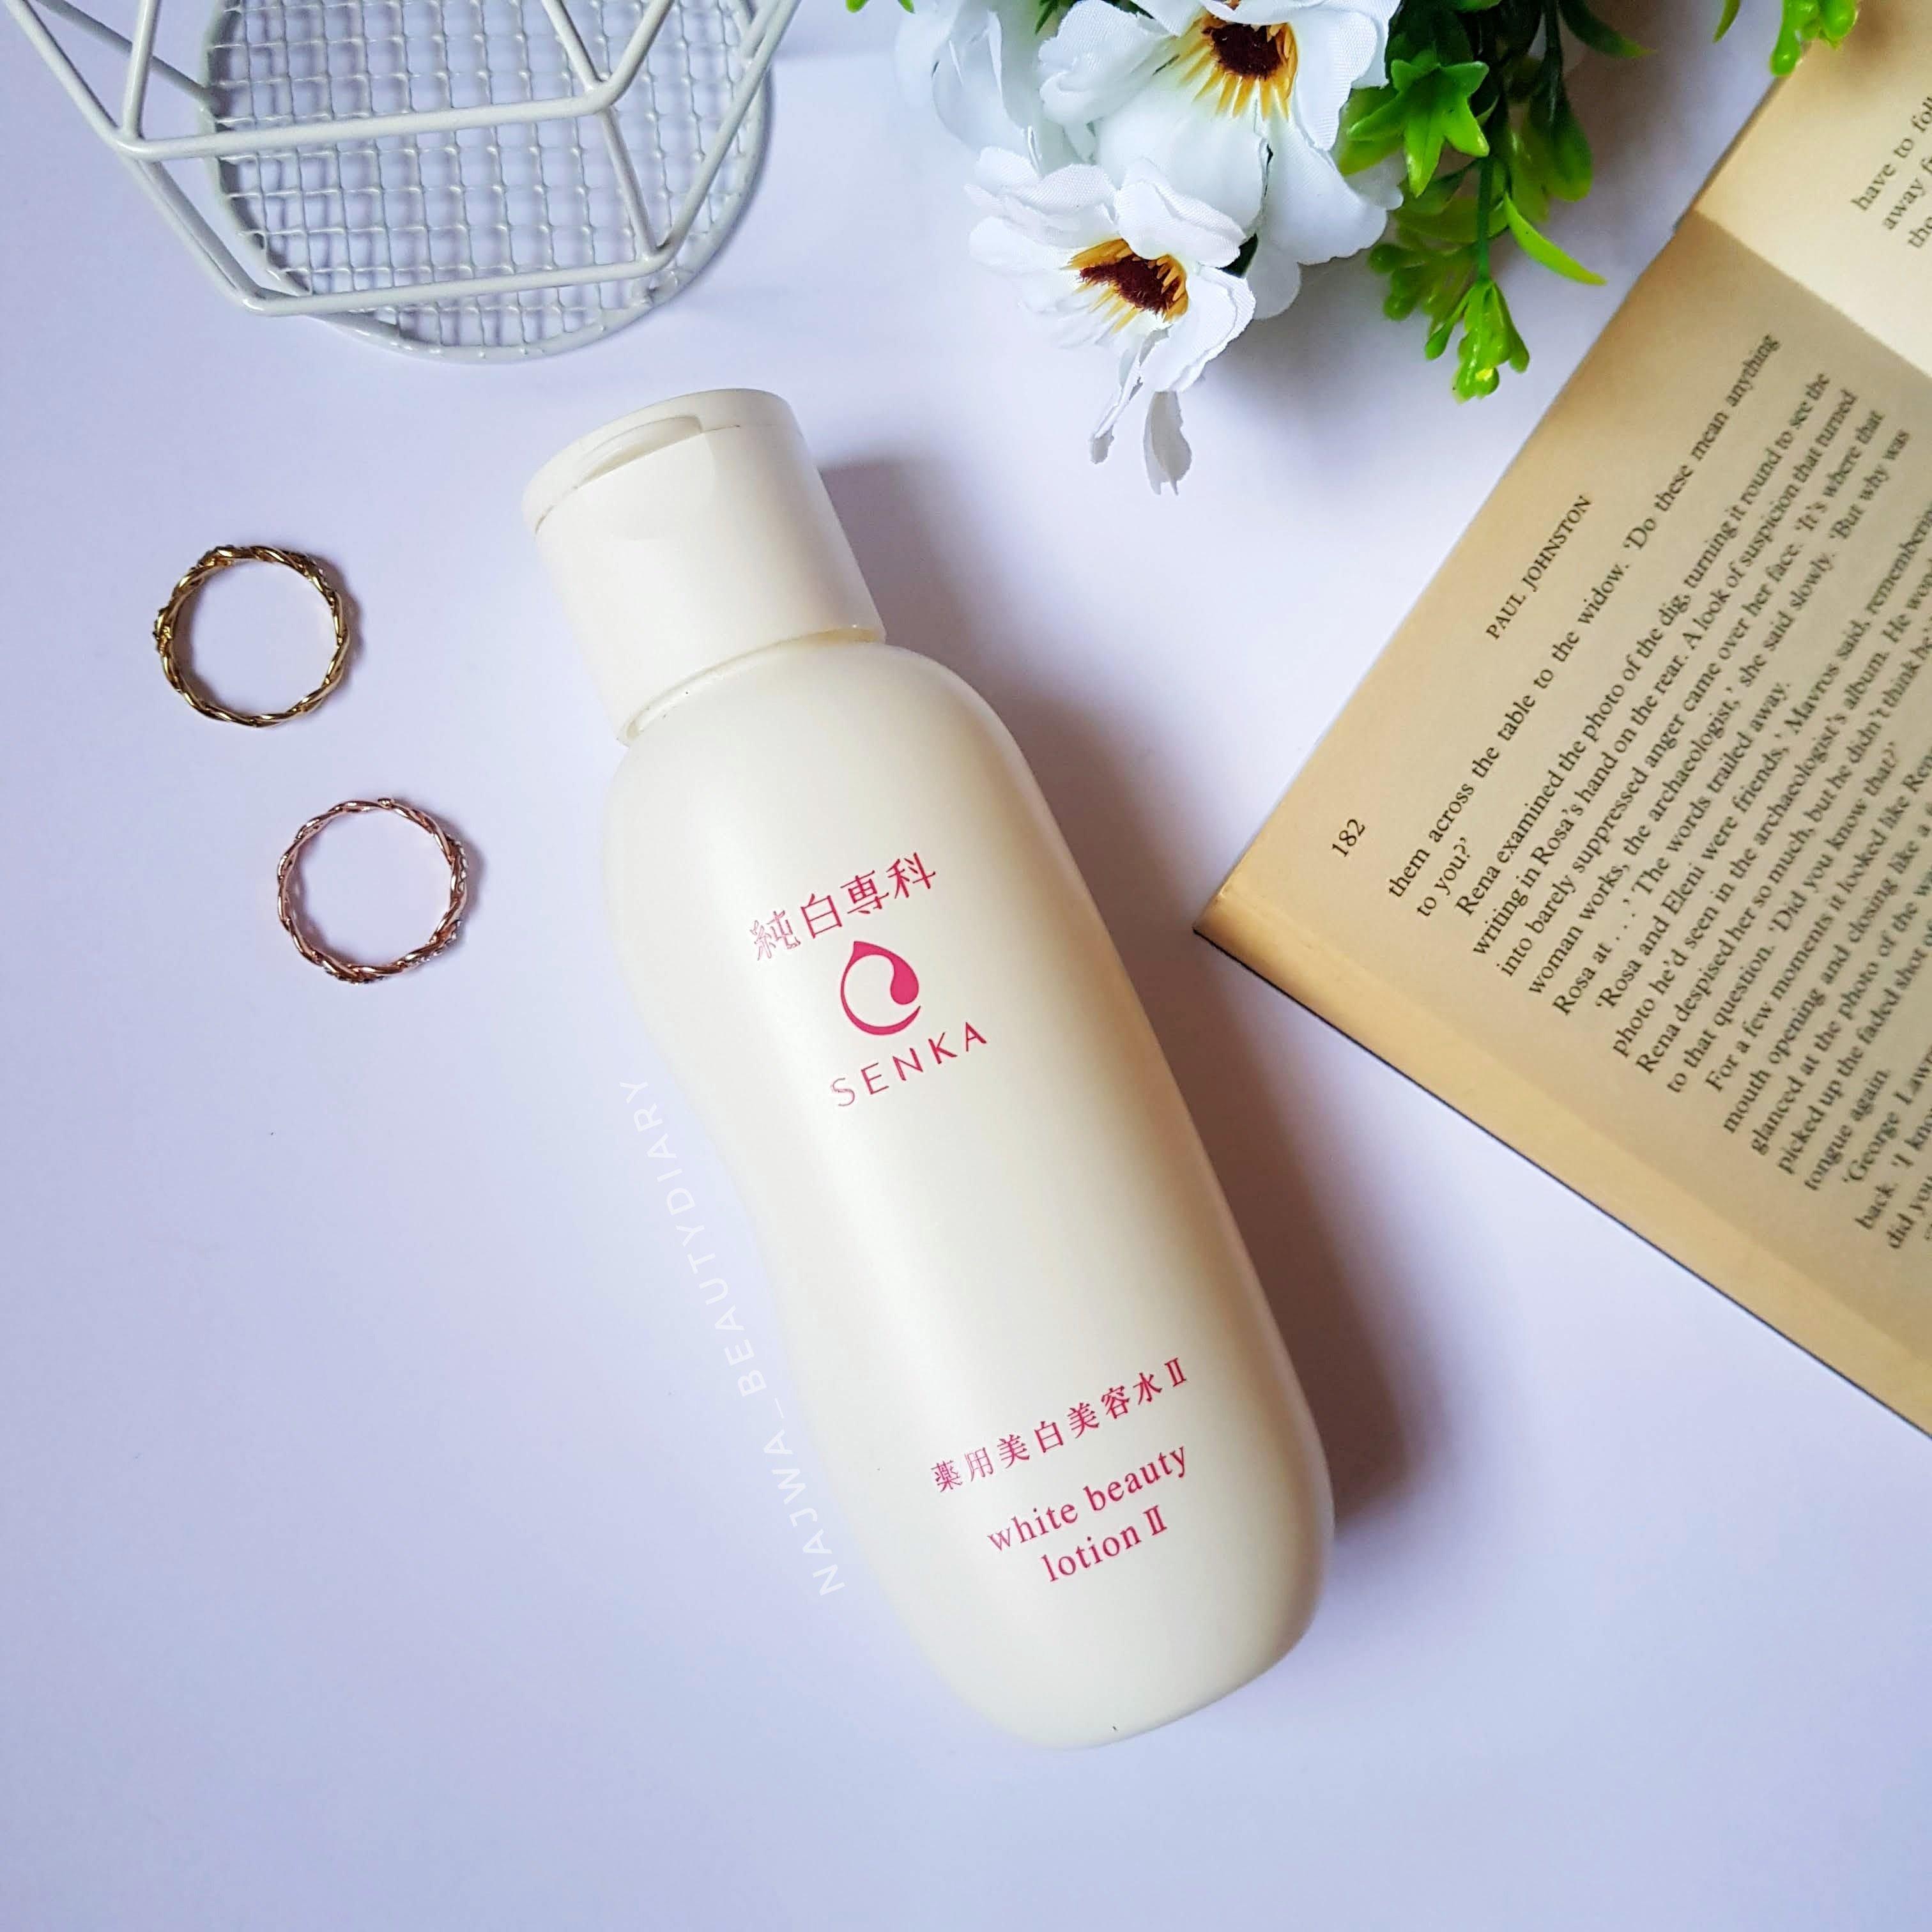 REVIEW | Senka Junpaku White Beauty Lotion